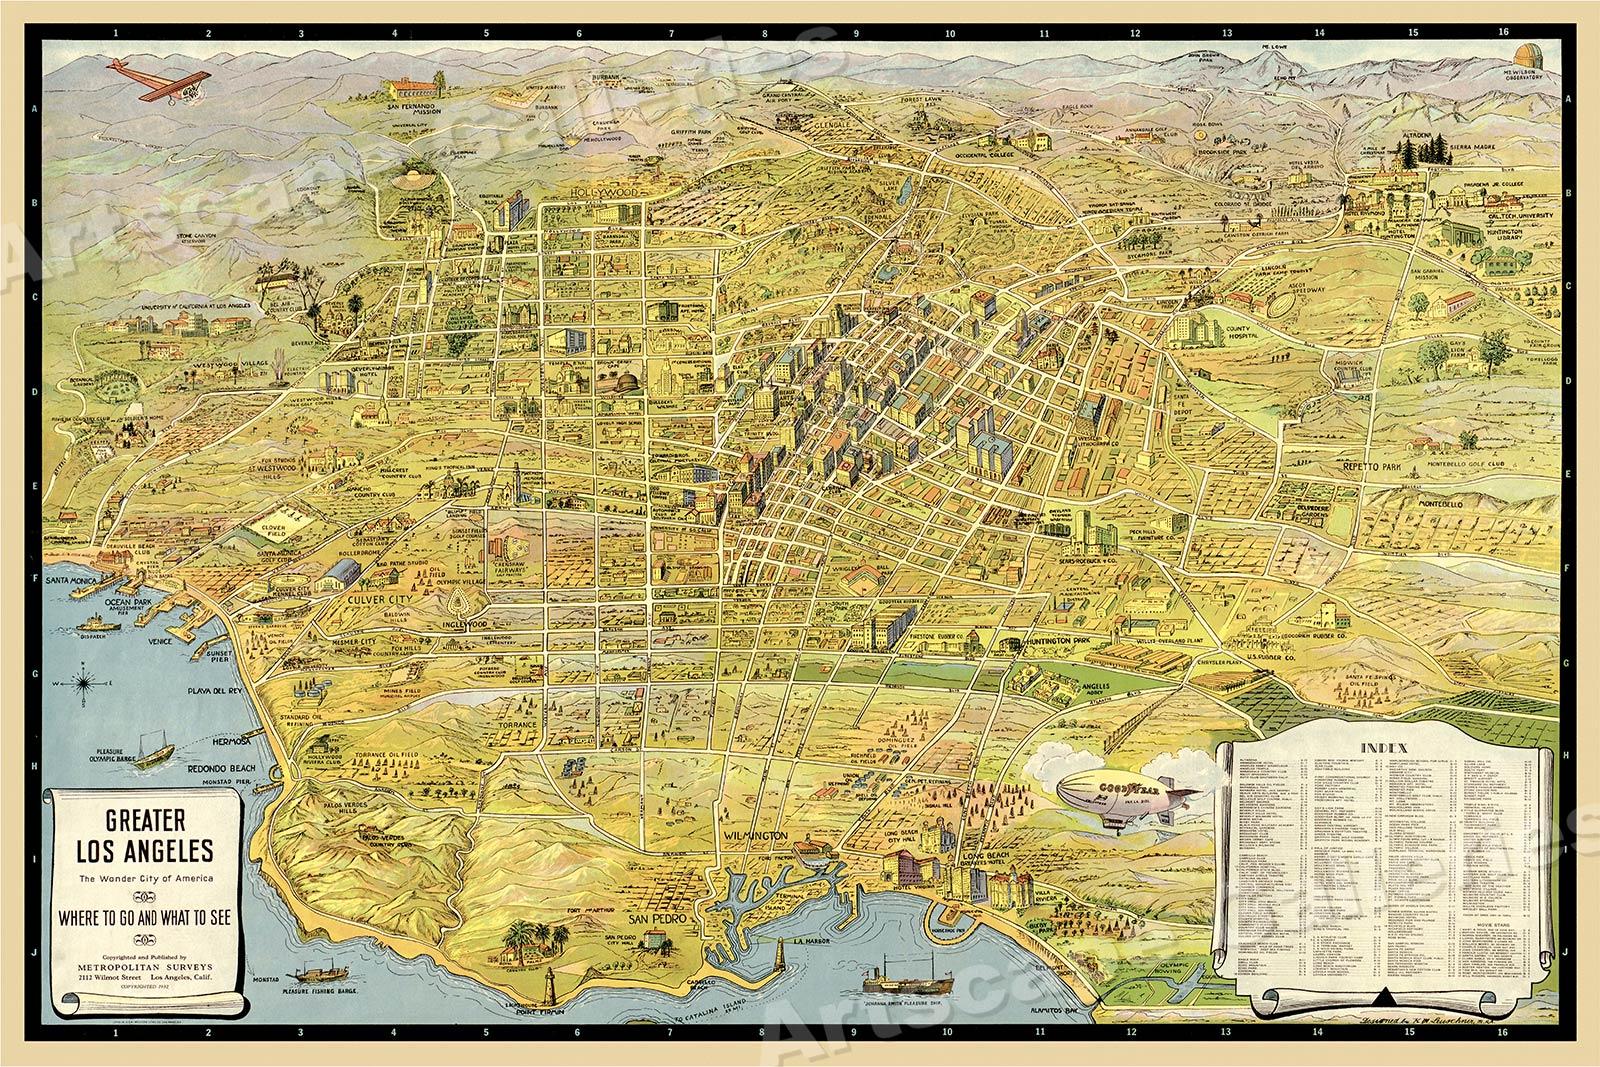 1932 Los Angeles California Panoramic Sightseeing Map 24x36